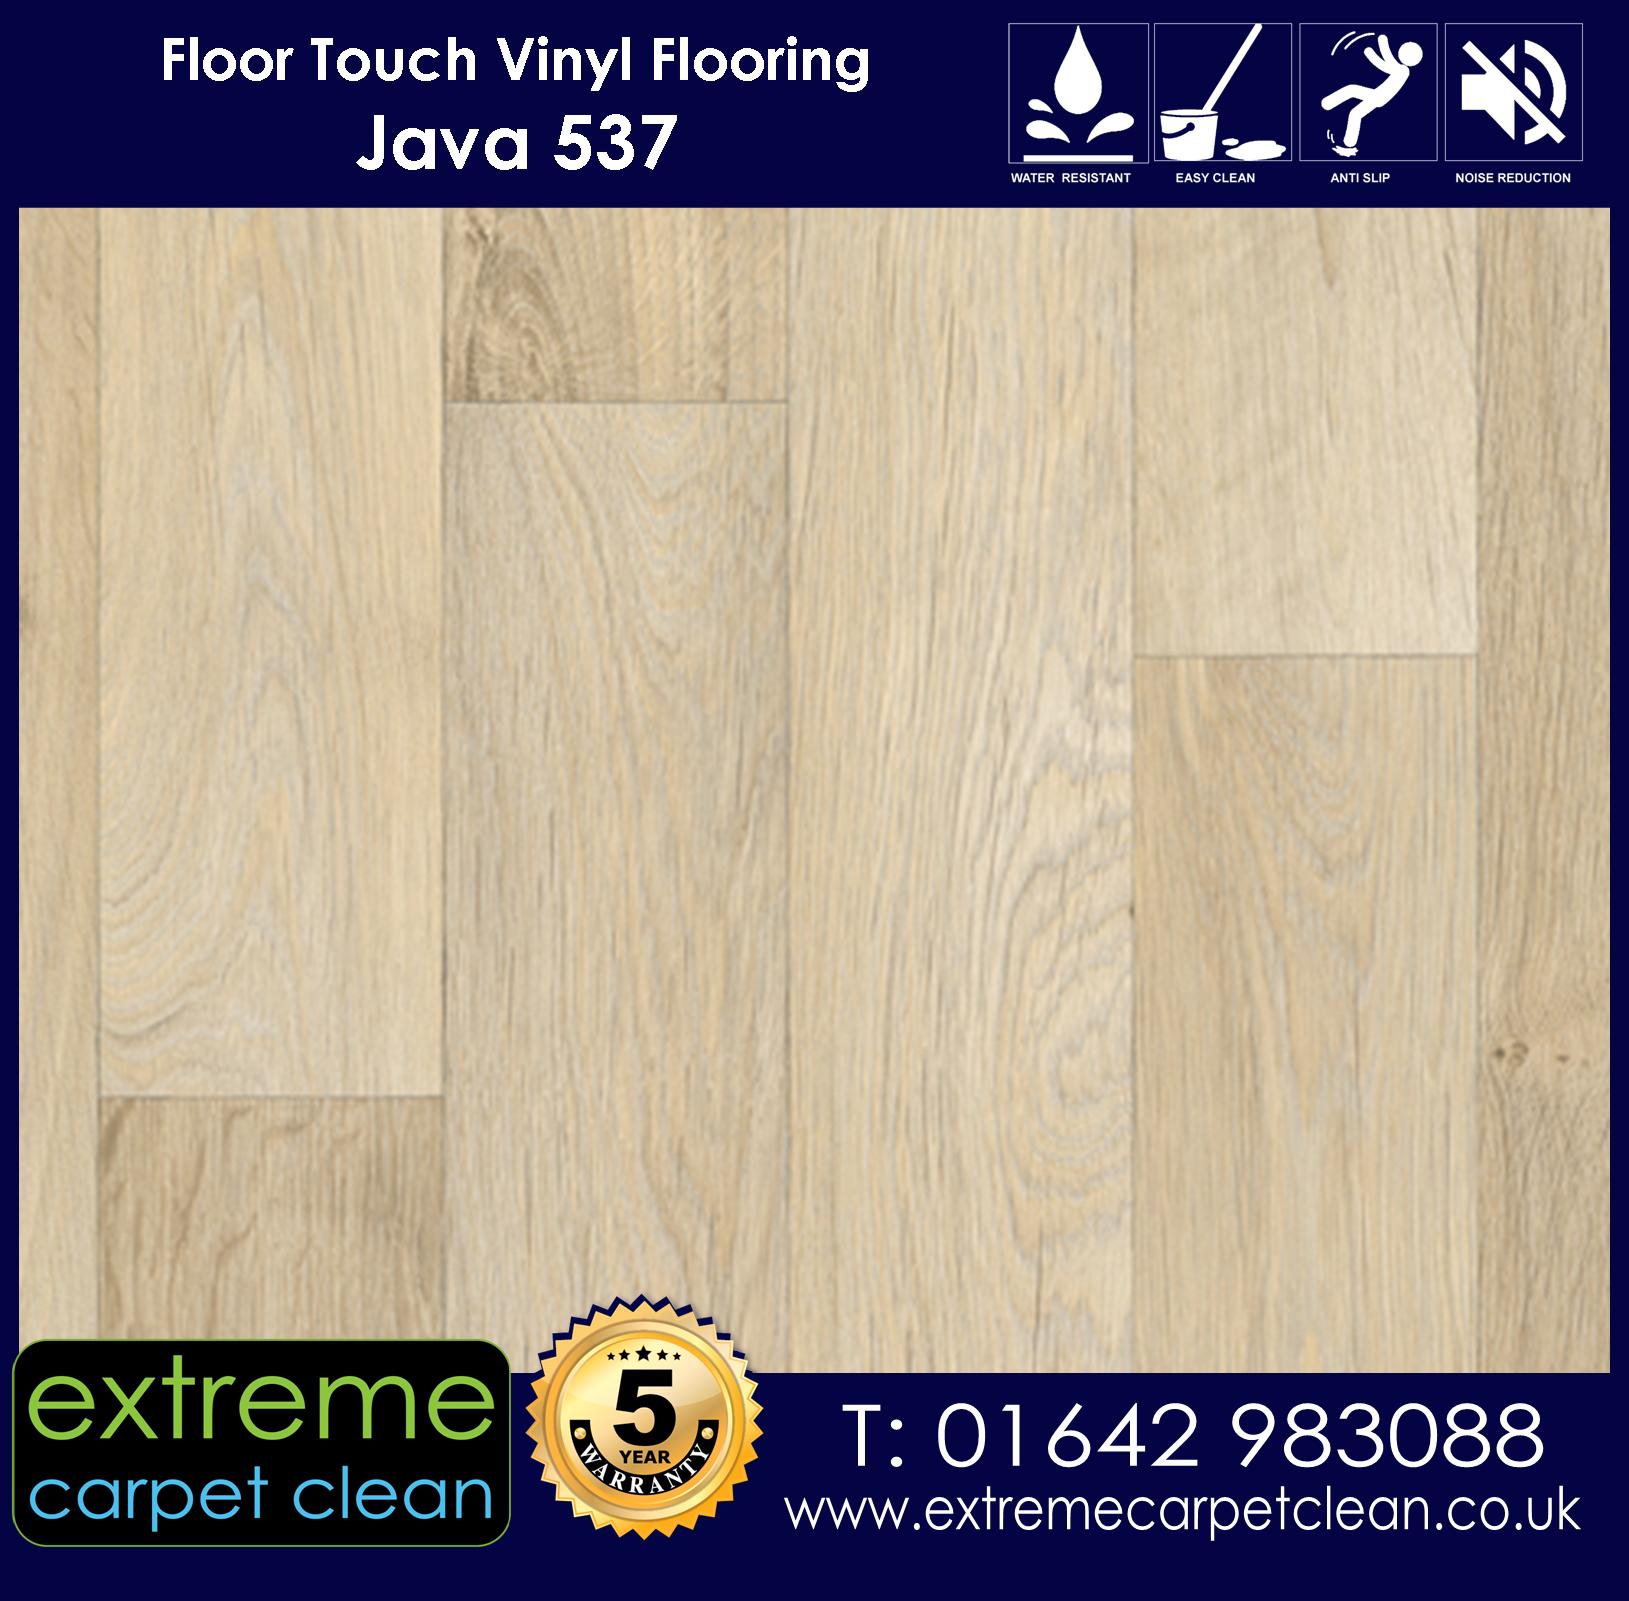 Extreme Carpet Clean. Vinyl Flooring. Java 537